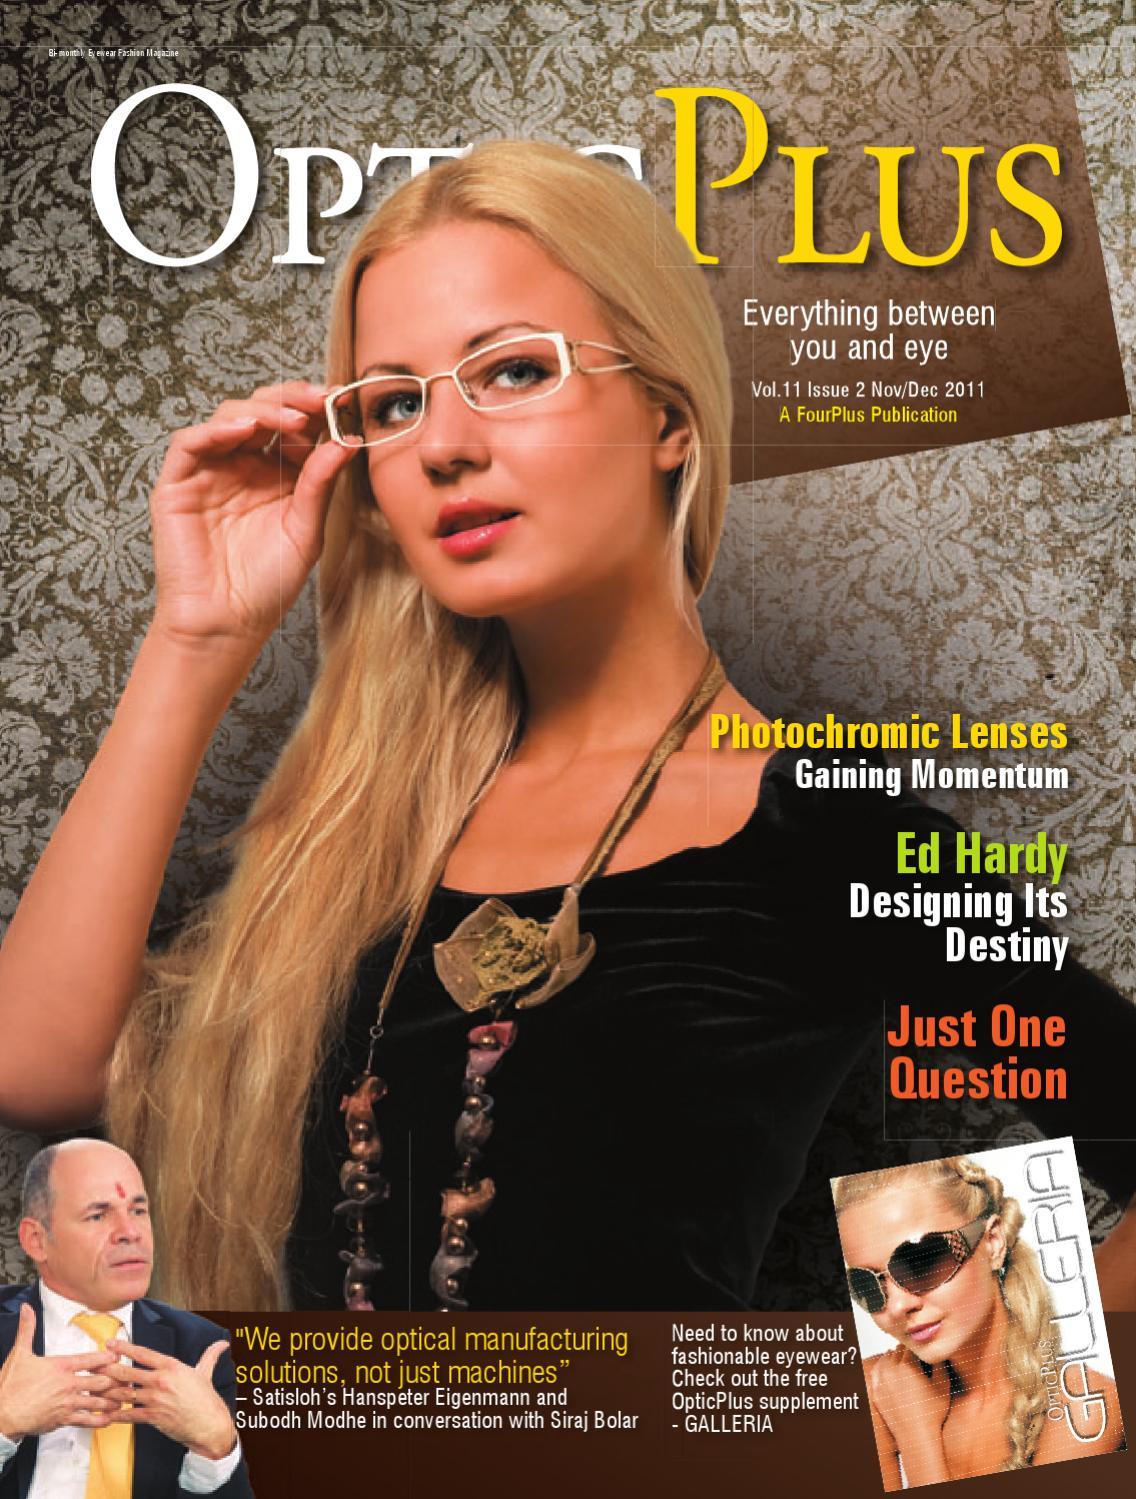 aa6fce4c04a9 OPTICPLUS by Optic Plus - issuu